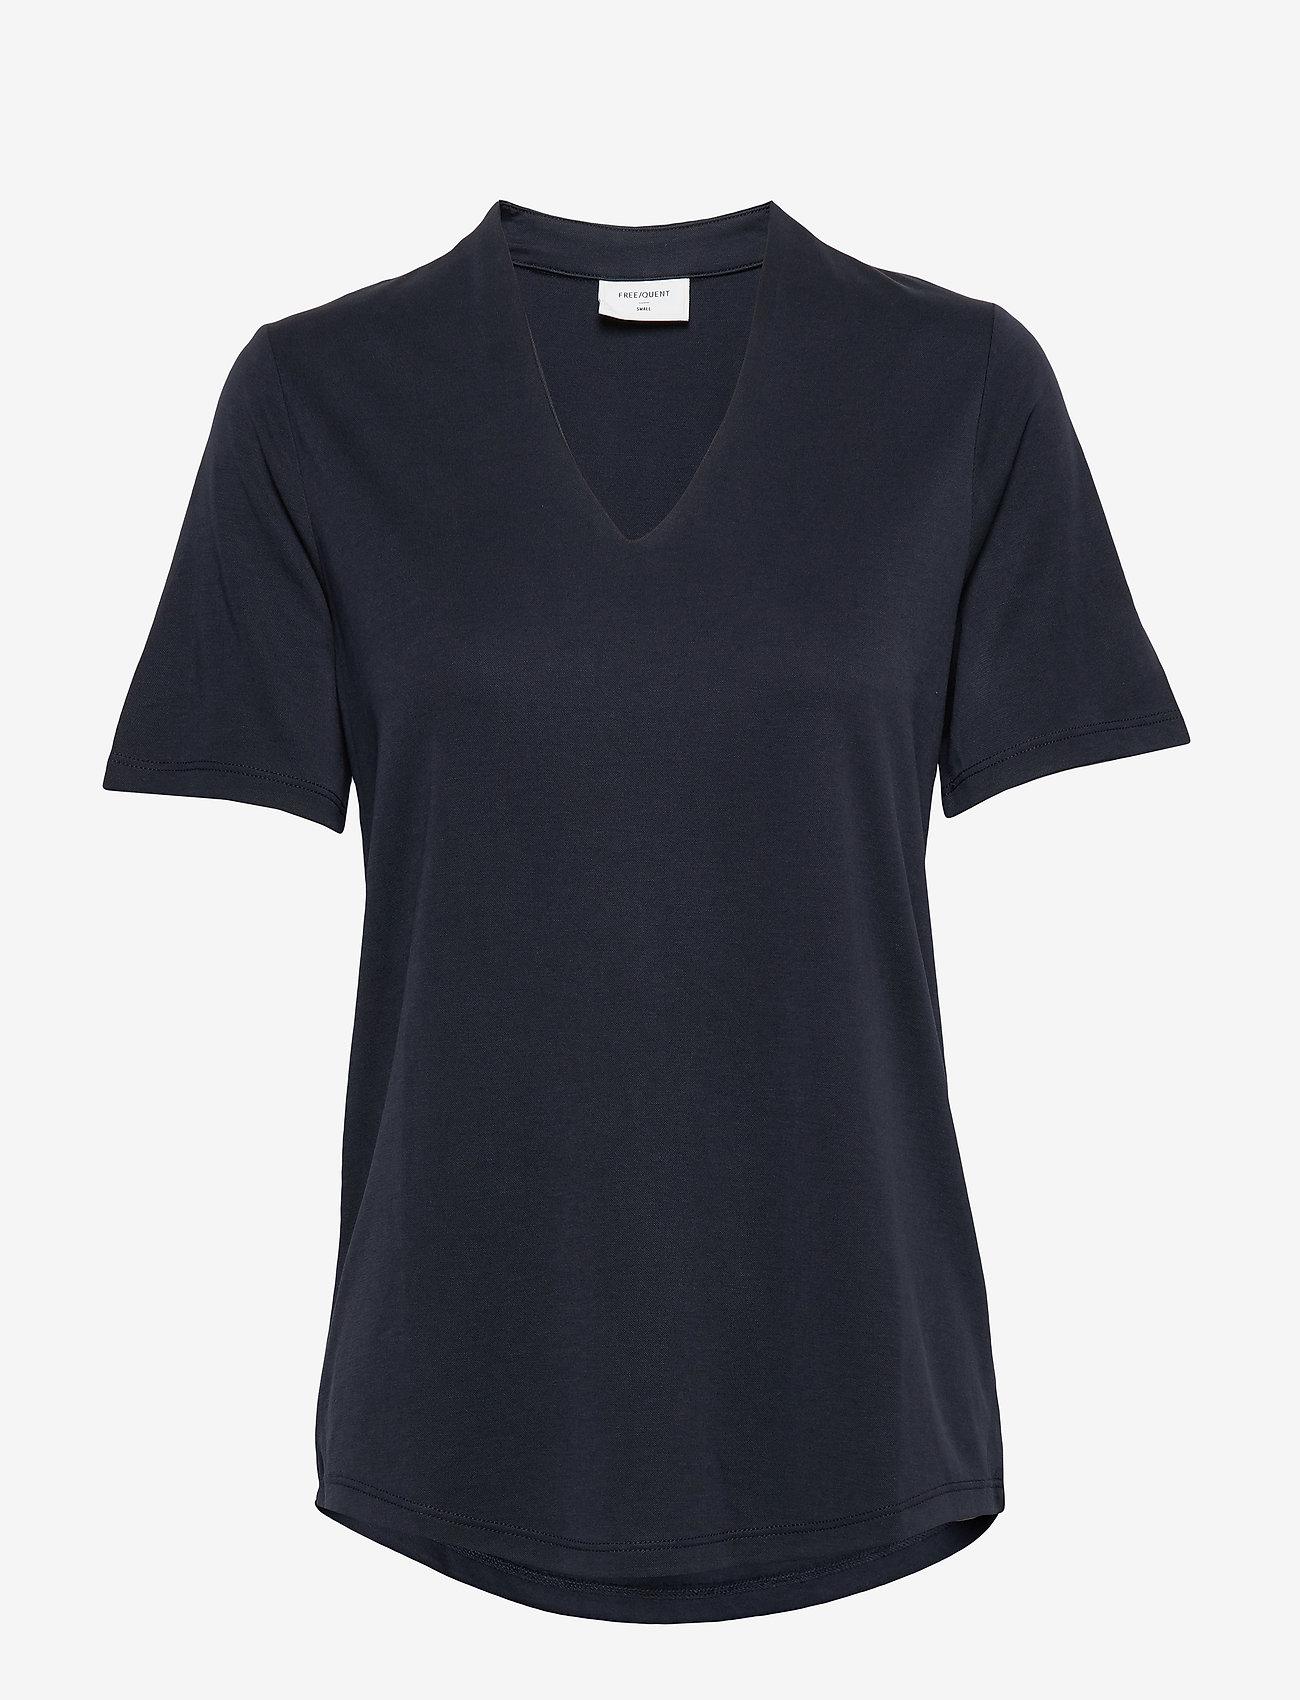 FREE/QUENT - FQYR-SS-BL - t-shirts - salute 19-4011 - 0